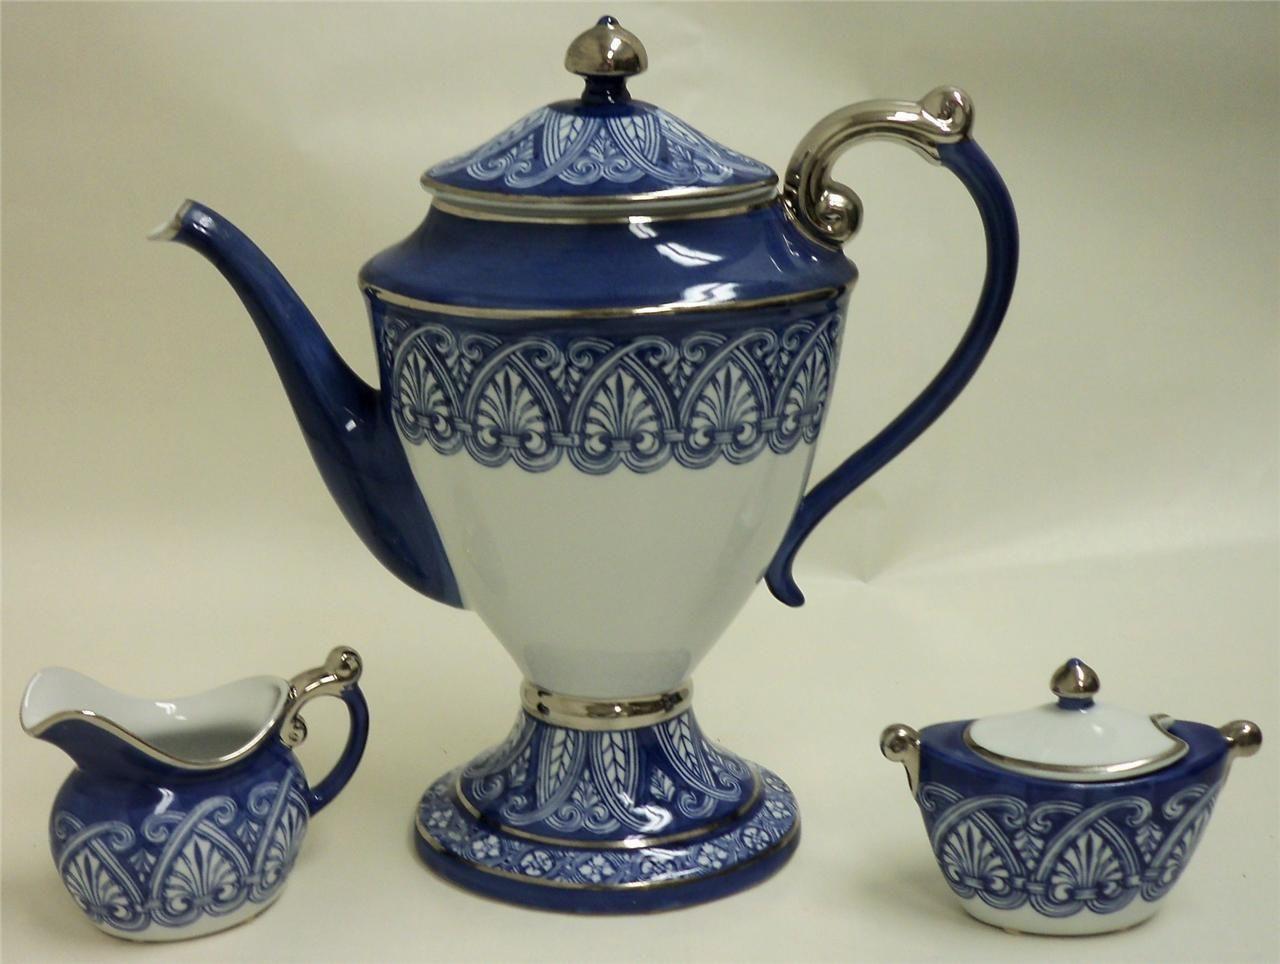 3 Piece Bombay Tea Coffee Set Tea Pot Sugar Bowl Cream Pourer Blue